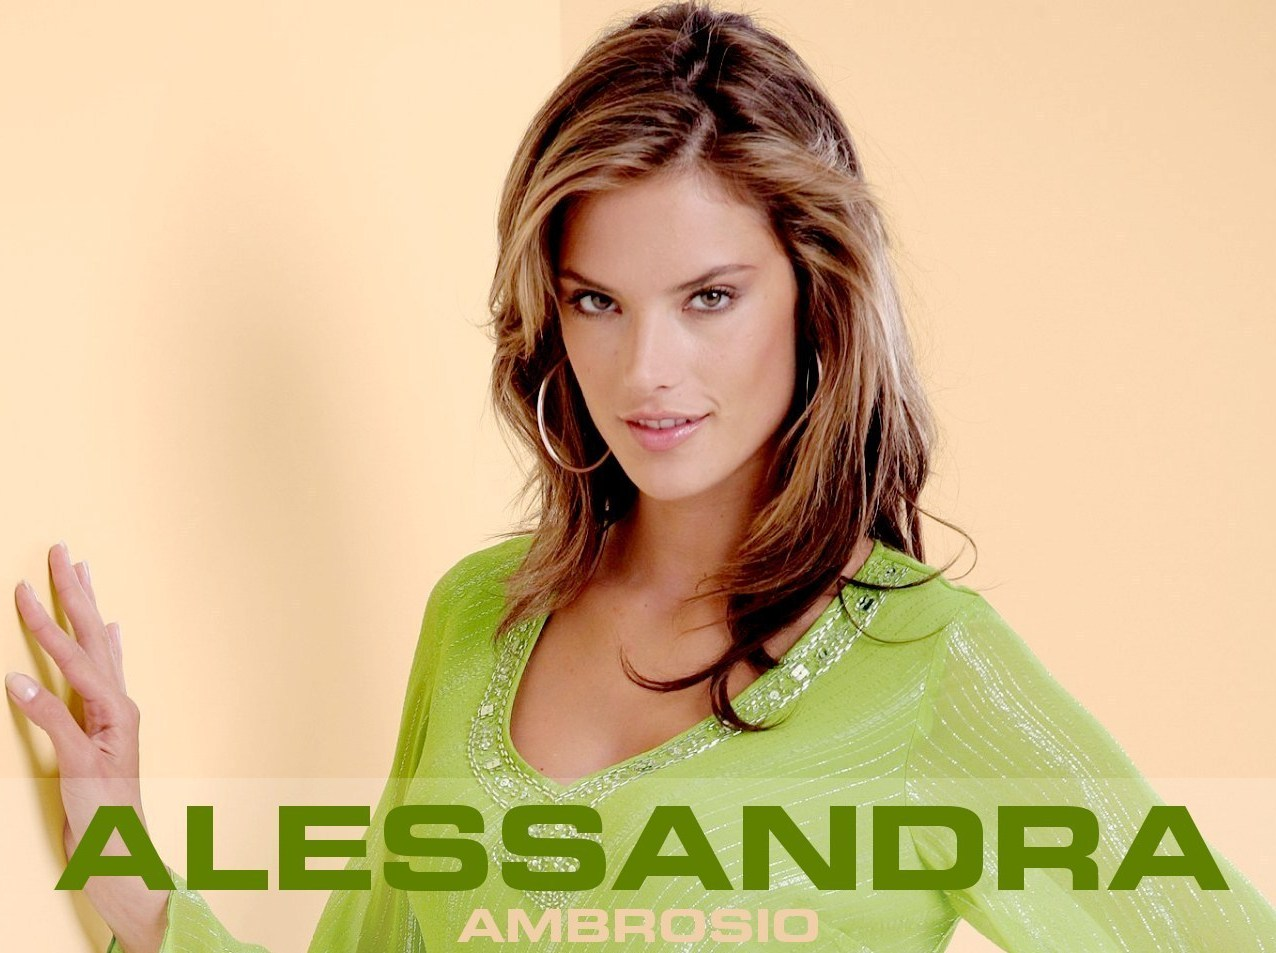 Hot Alessandra Ambrosio HD Image